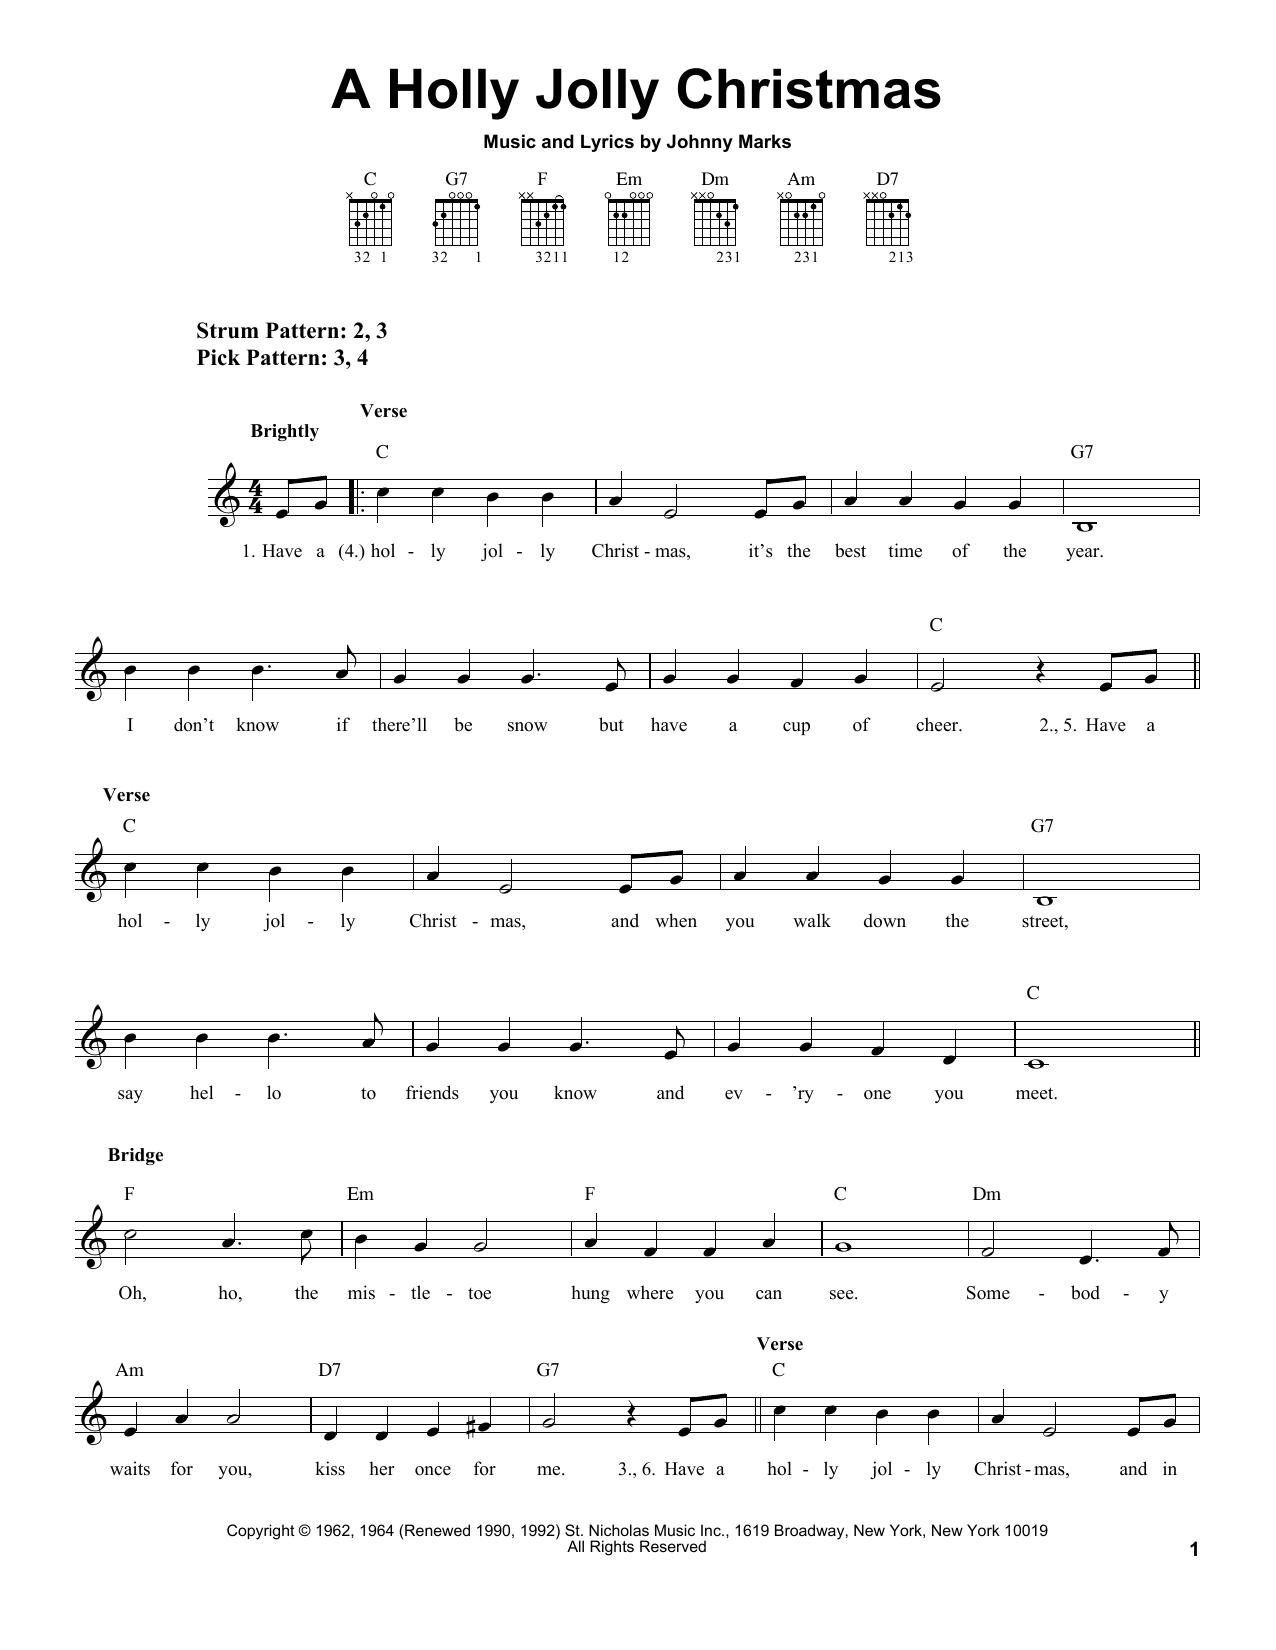 A Holly Jolly Christmas sheet music